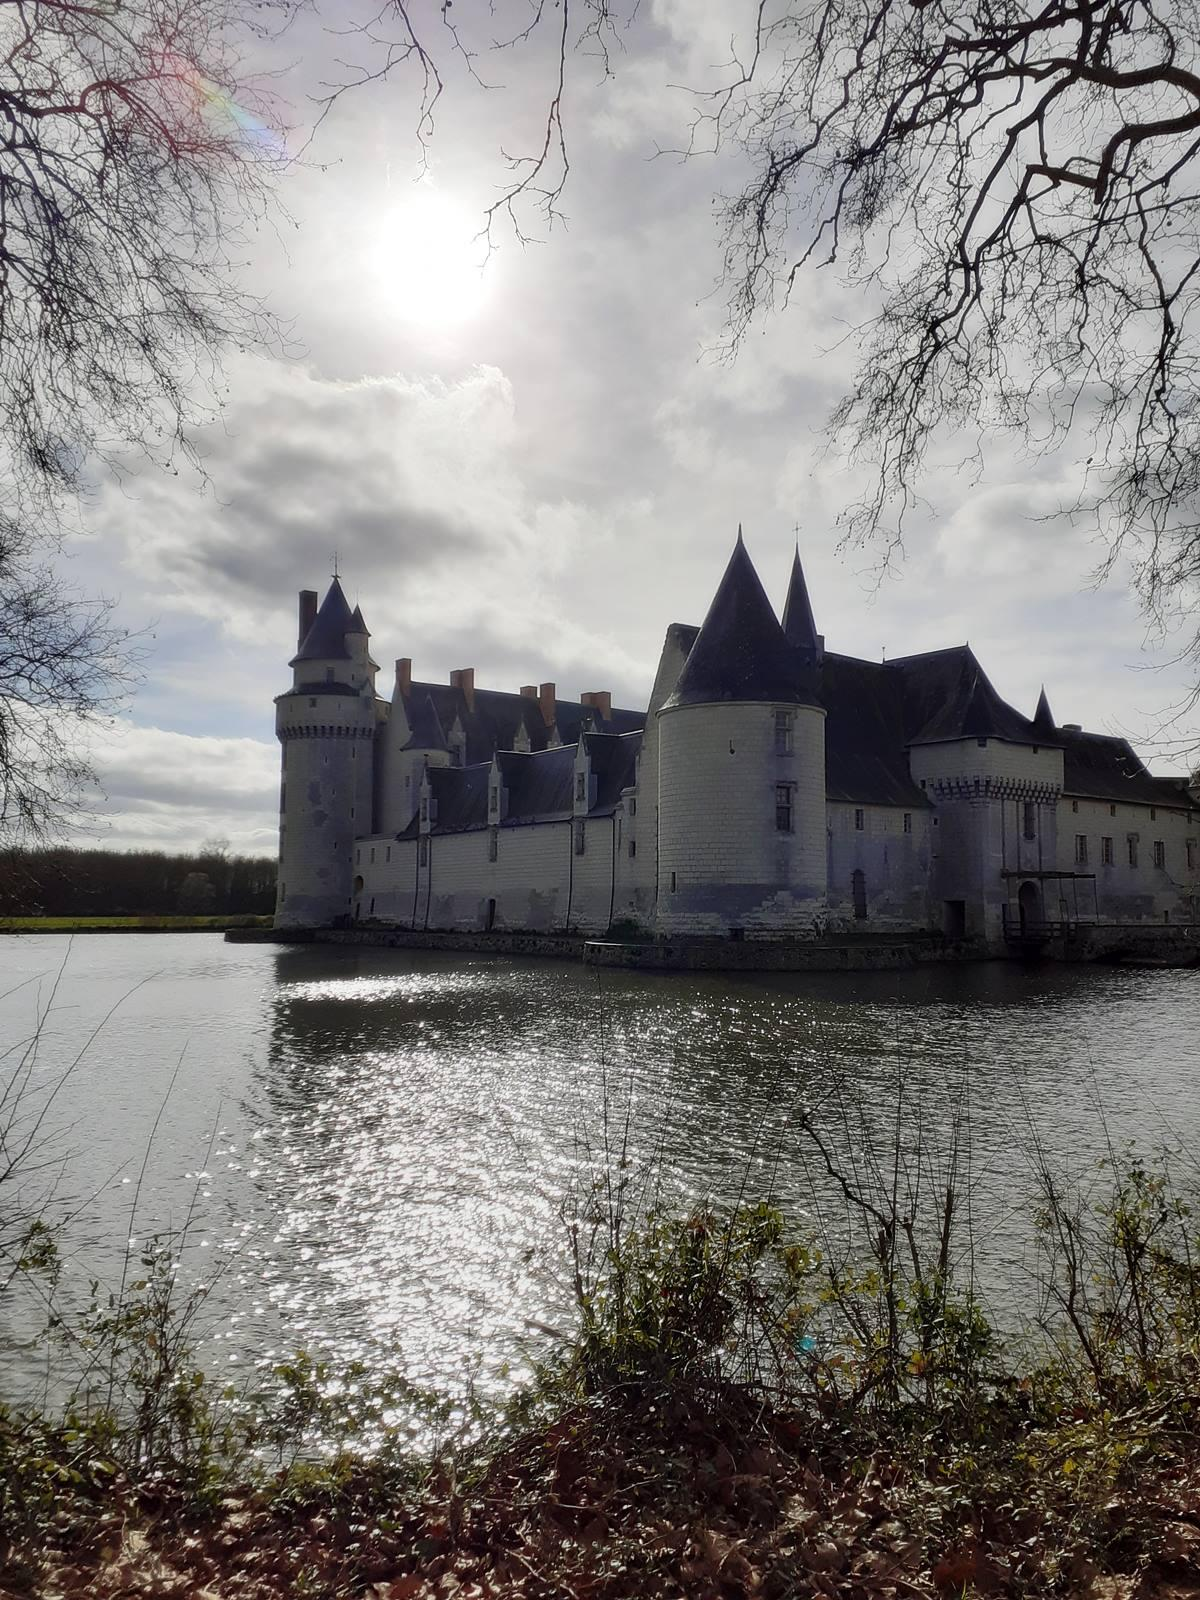 Chateau plessis bourre maine loire tourisme20200222 150542